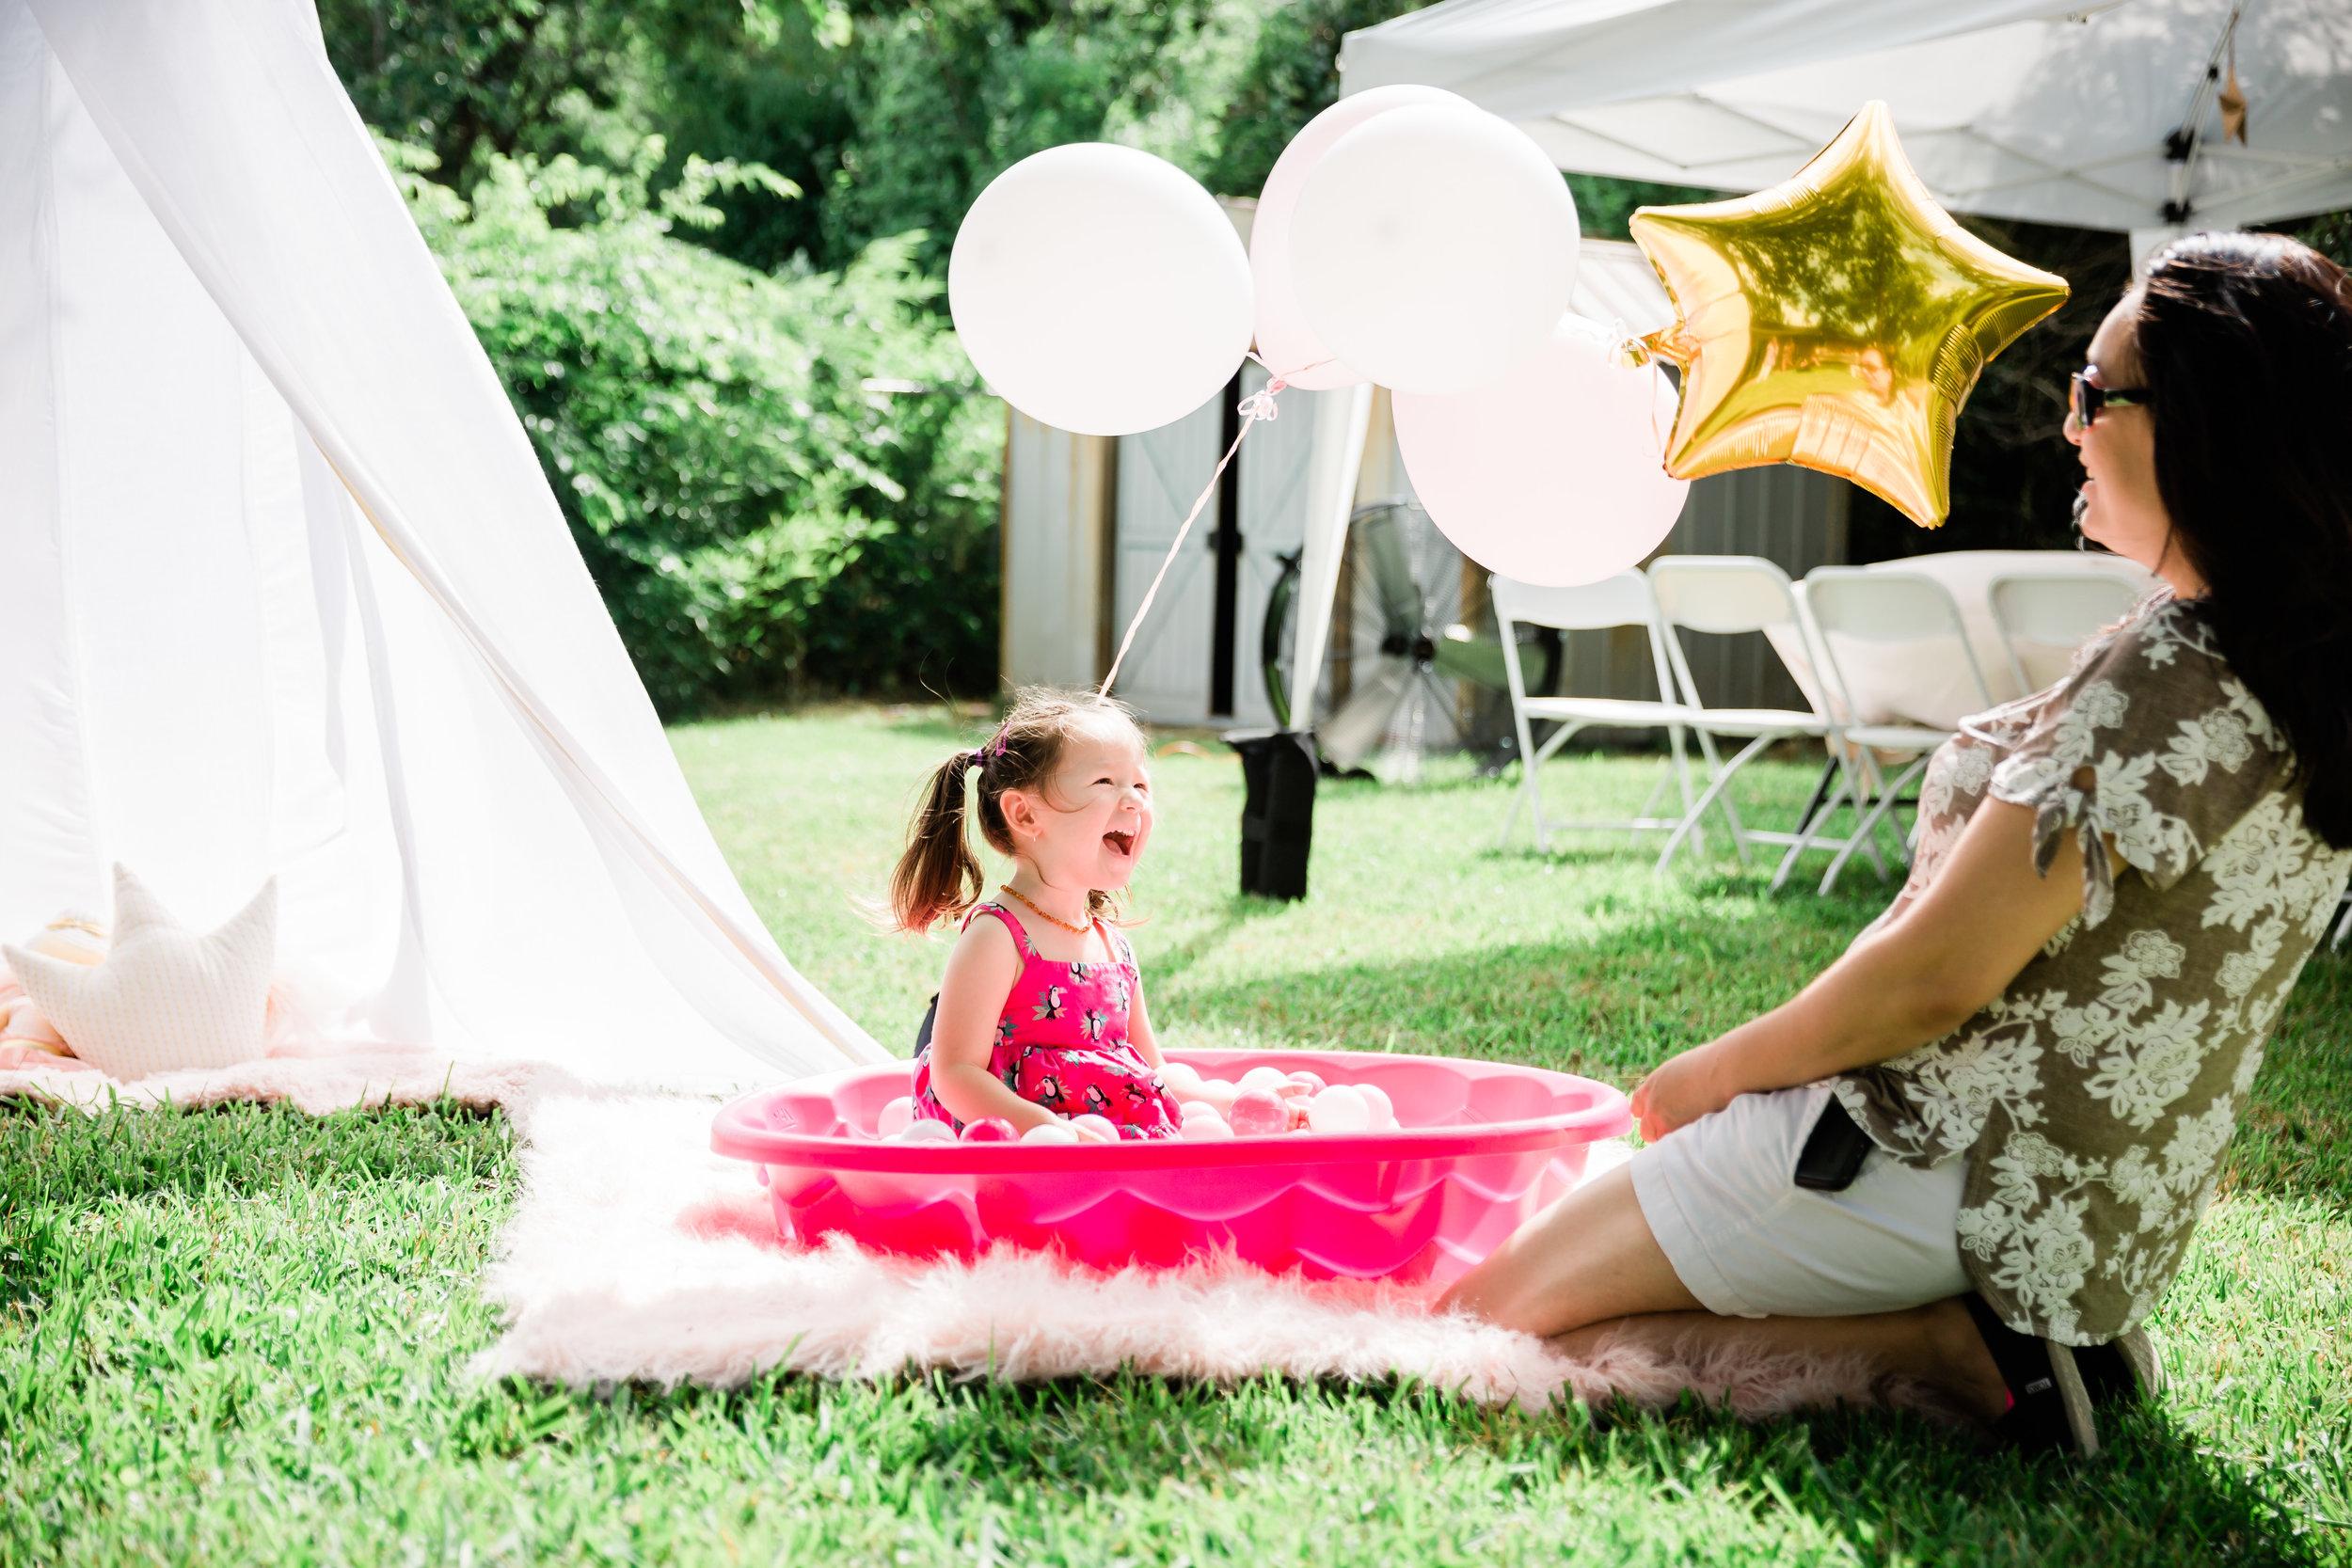 nashville-franklin-lifestyle-photographer-kids-birthday-15.jpg